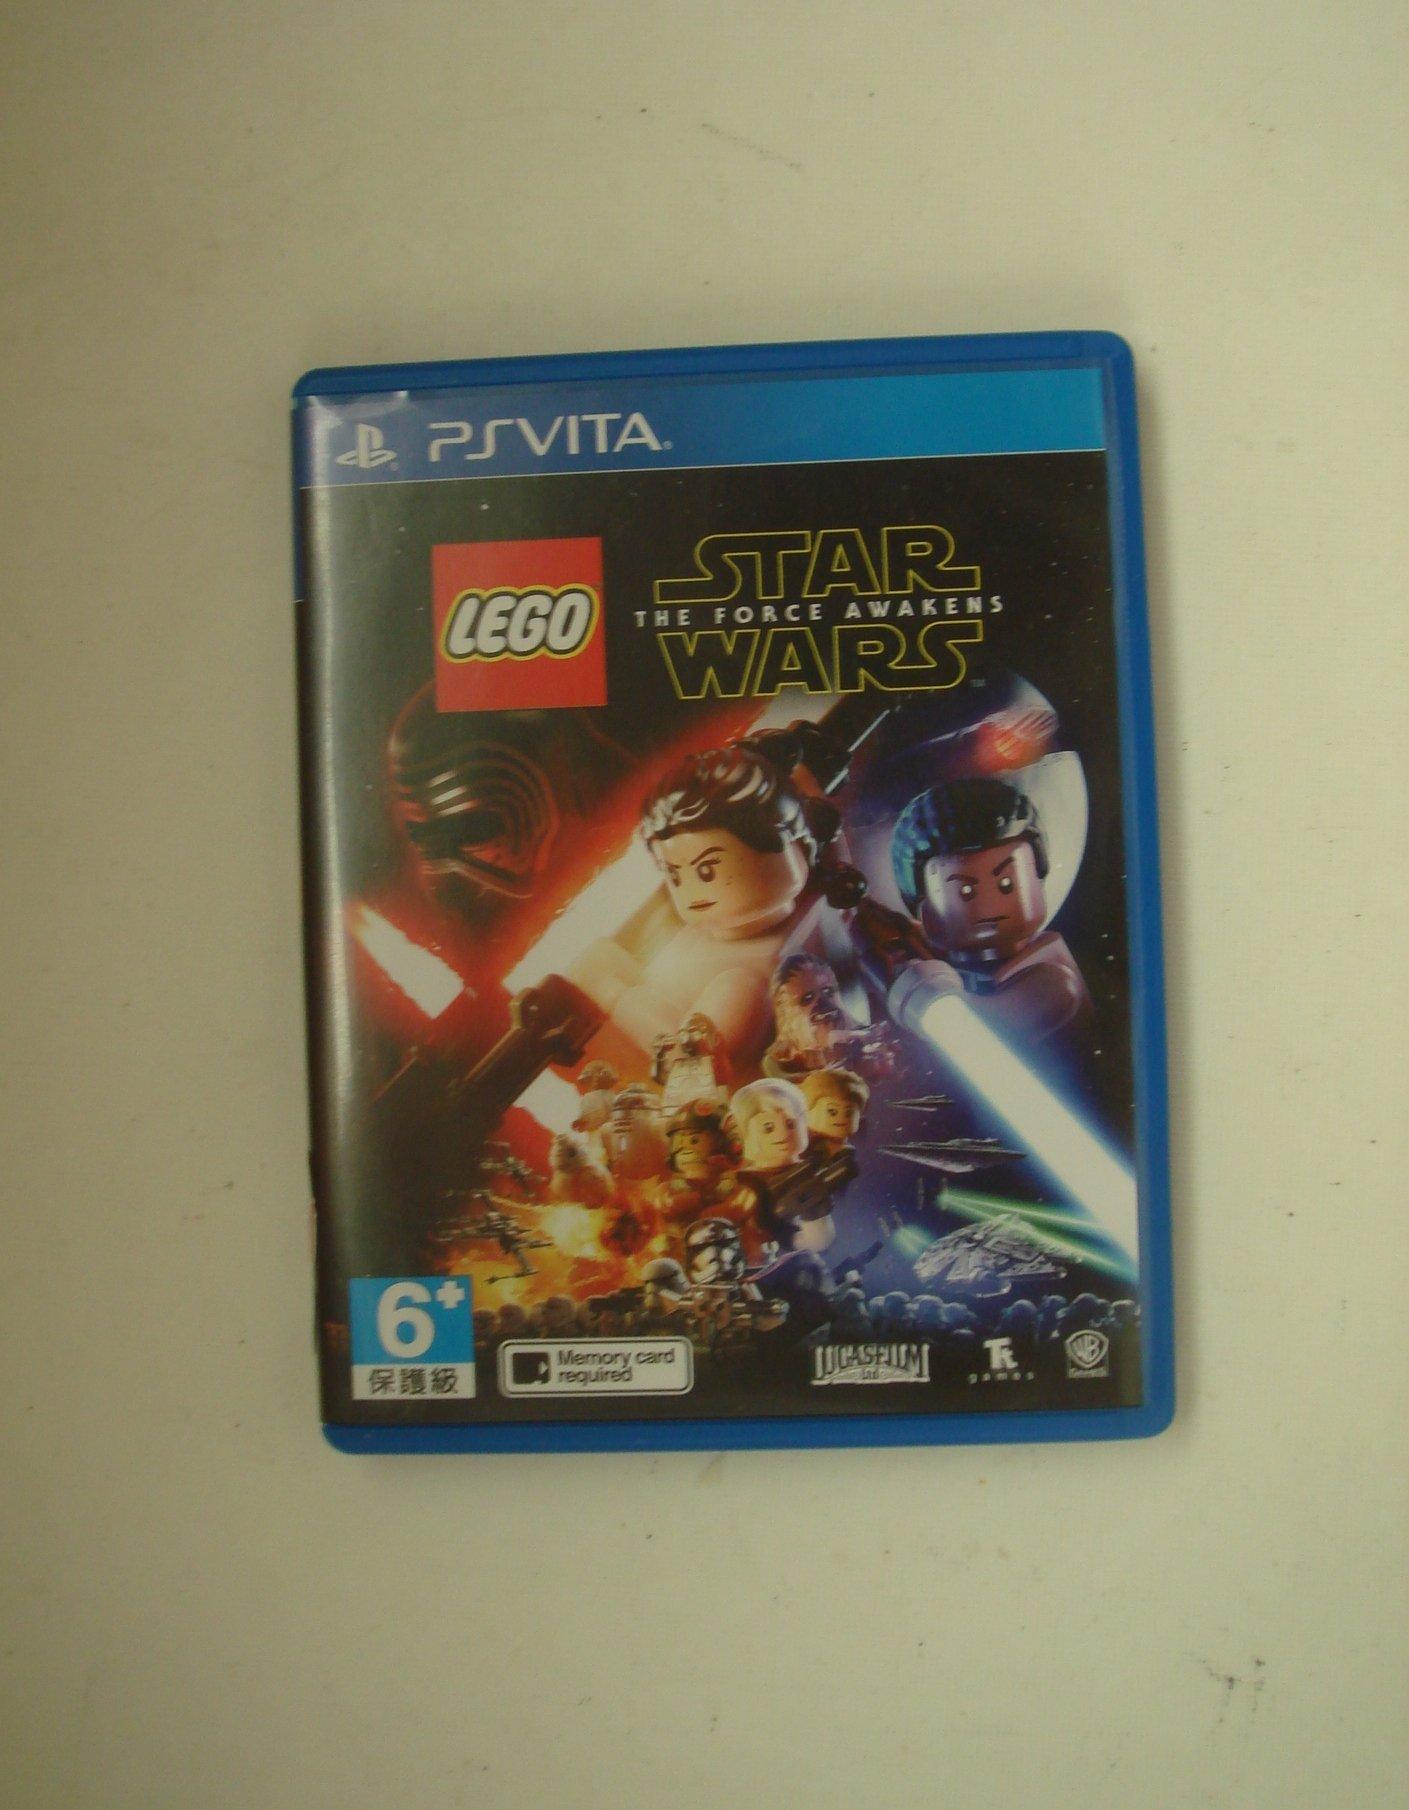 PSV 樂高星際大戰:原力覺醒 英文版 LEGO Star Wars